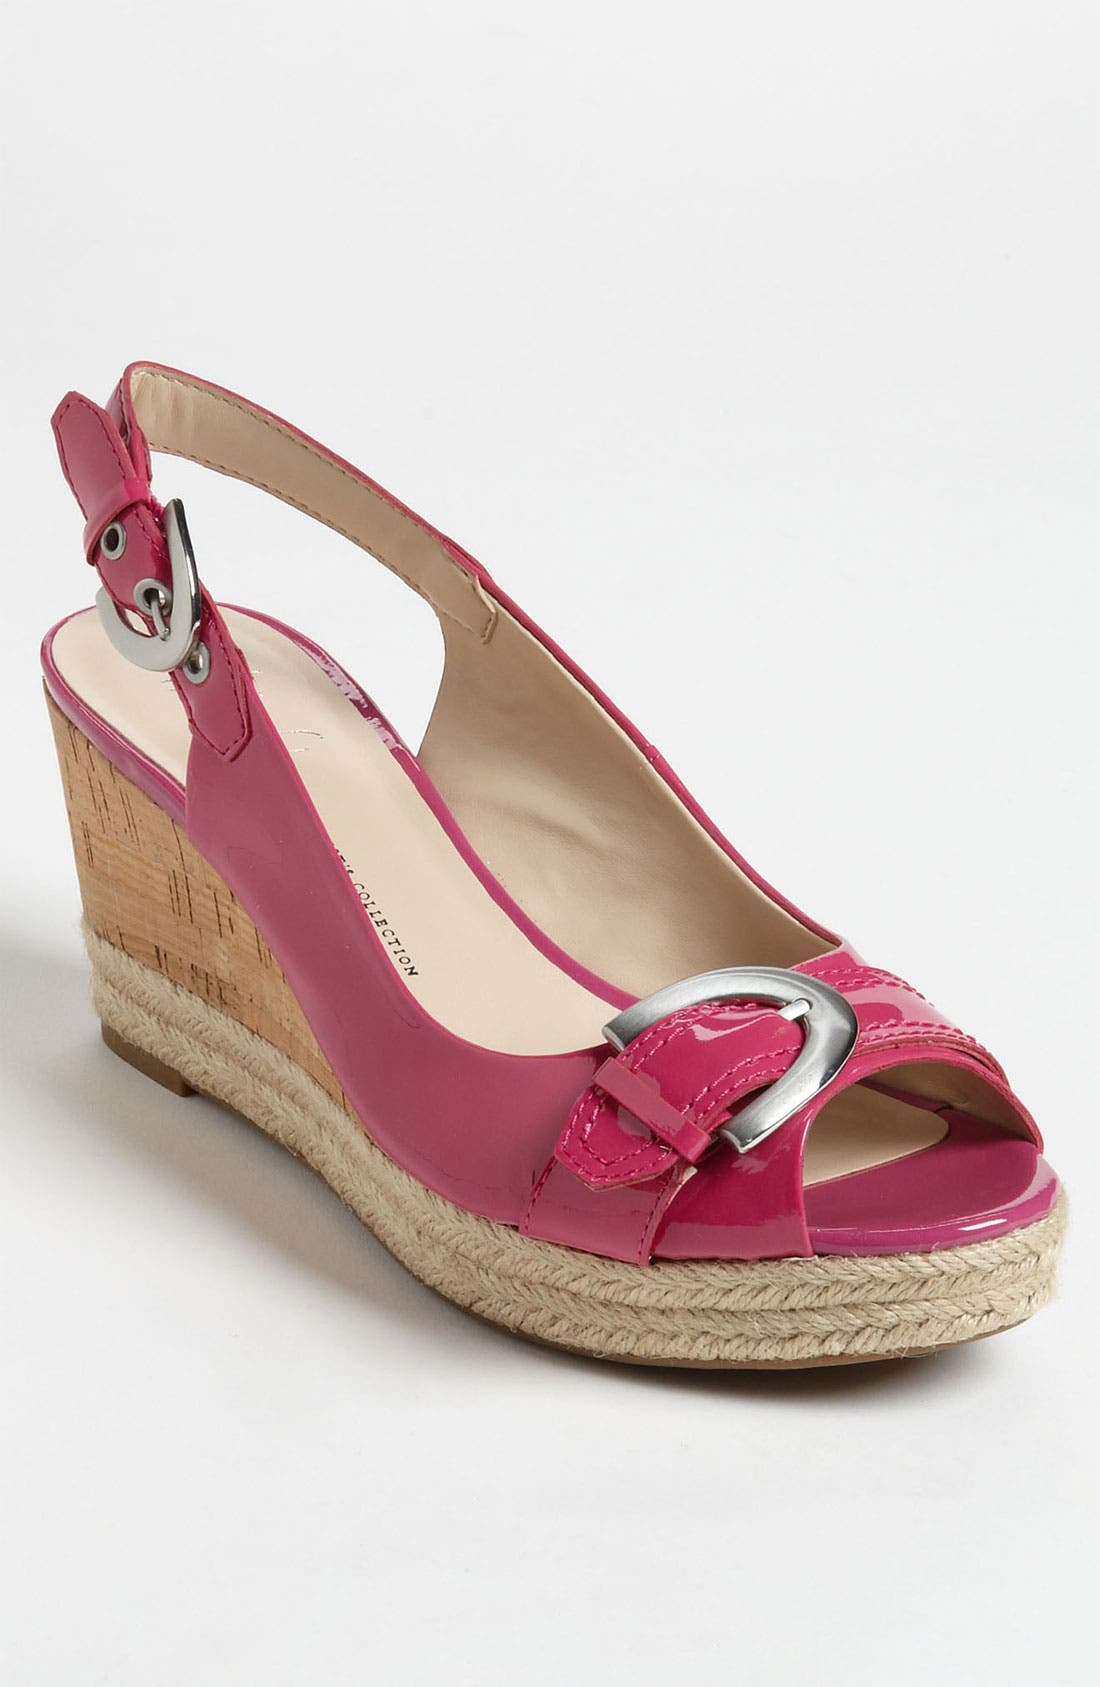 Alternate Image 1 Selected - Franco Sarto 'Kendra' Sandal (Special Purchase)